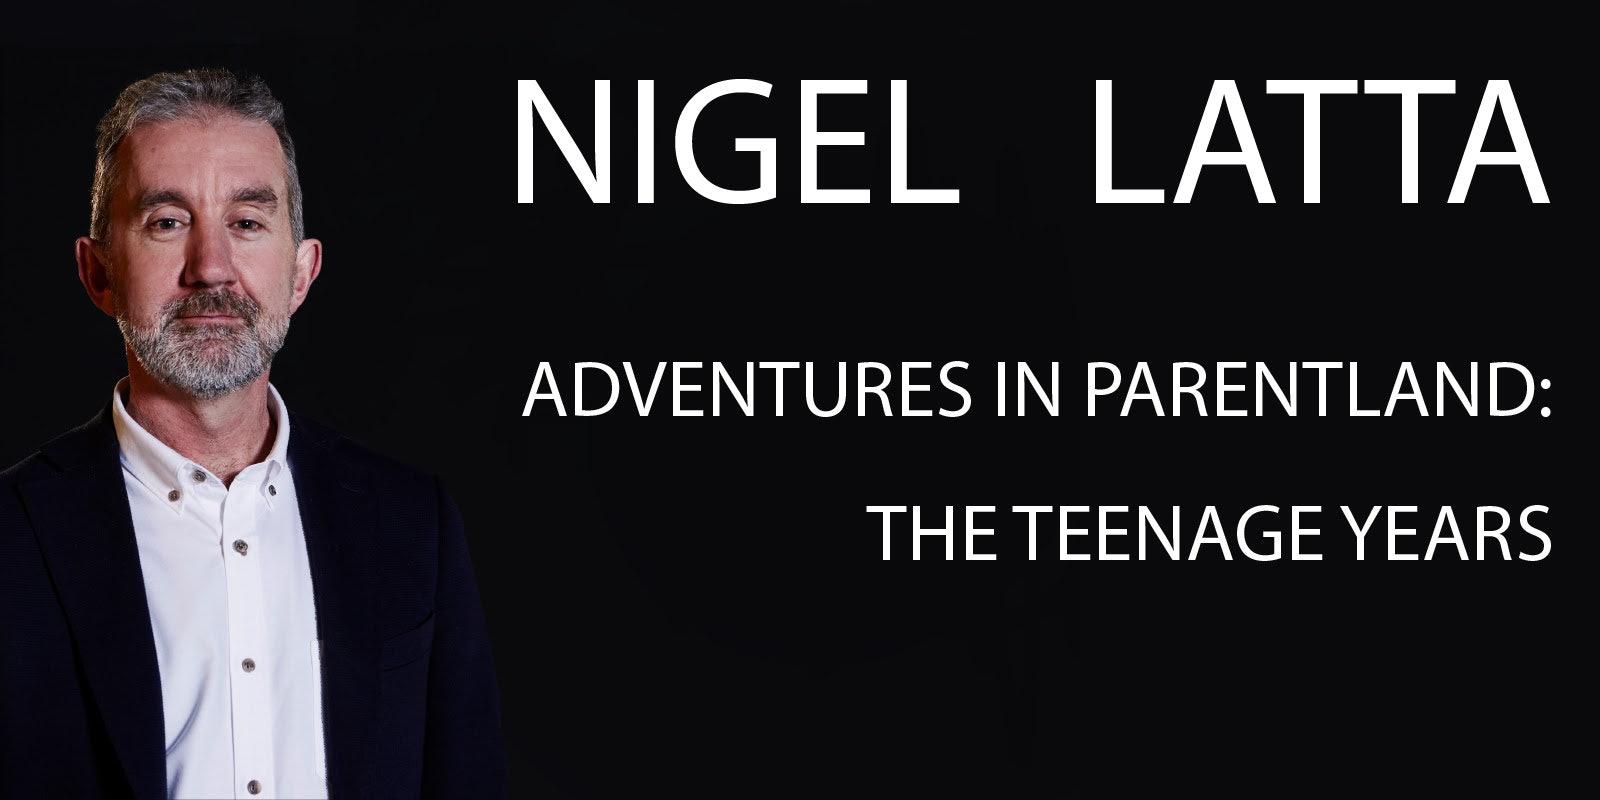 Nigel Latta - Adventures in Parentland: The Teenage Years